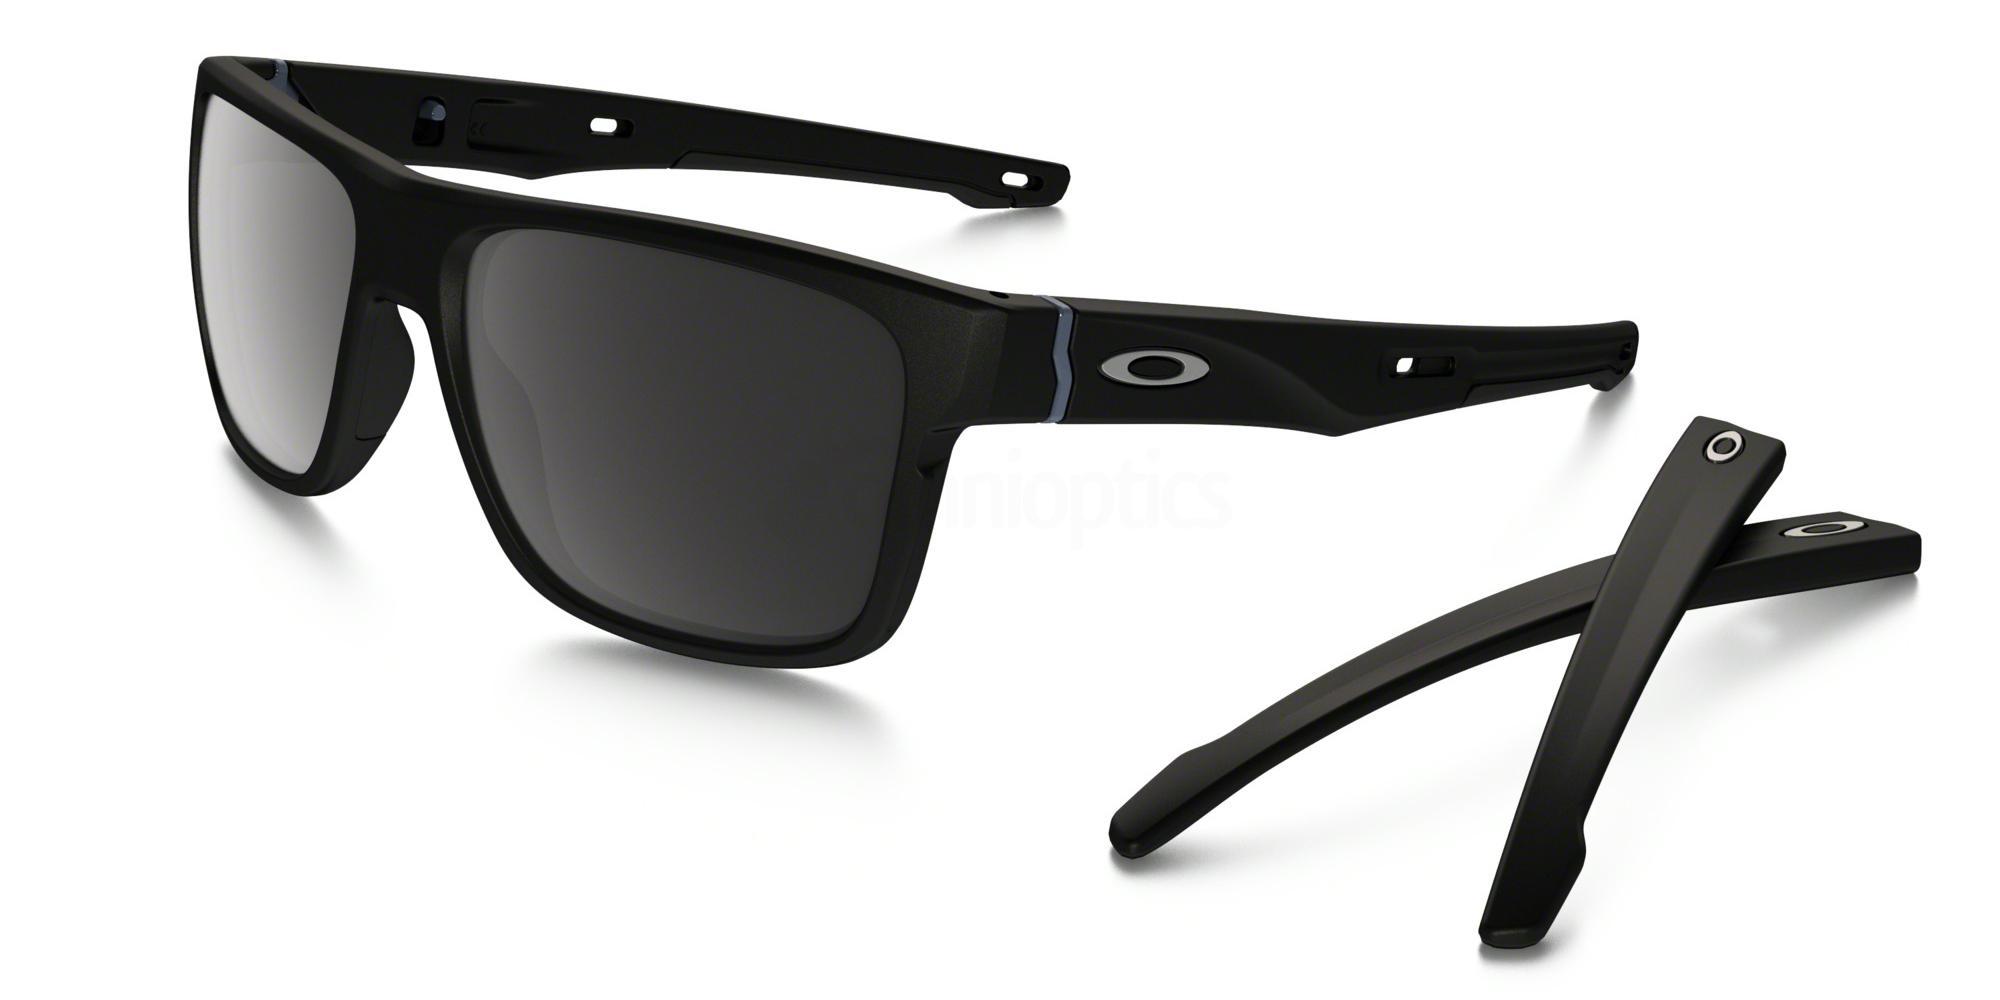 Oakley Crossrange Sonnenbrille Grau AghKThs